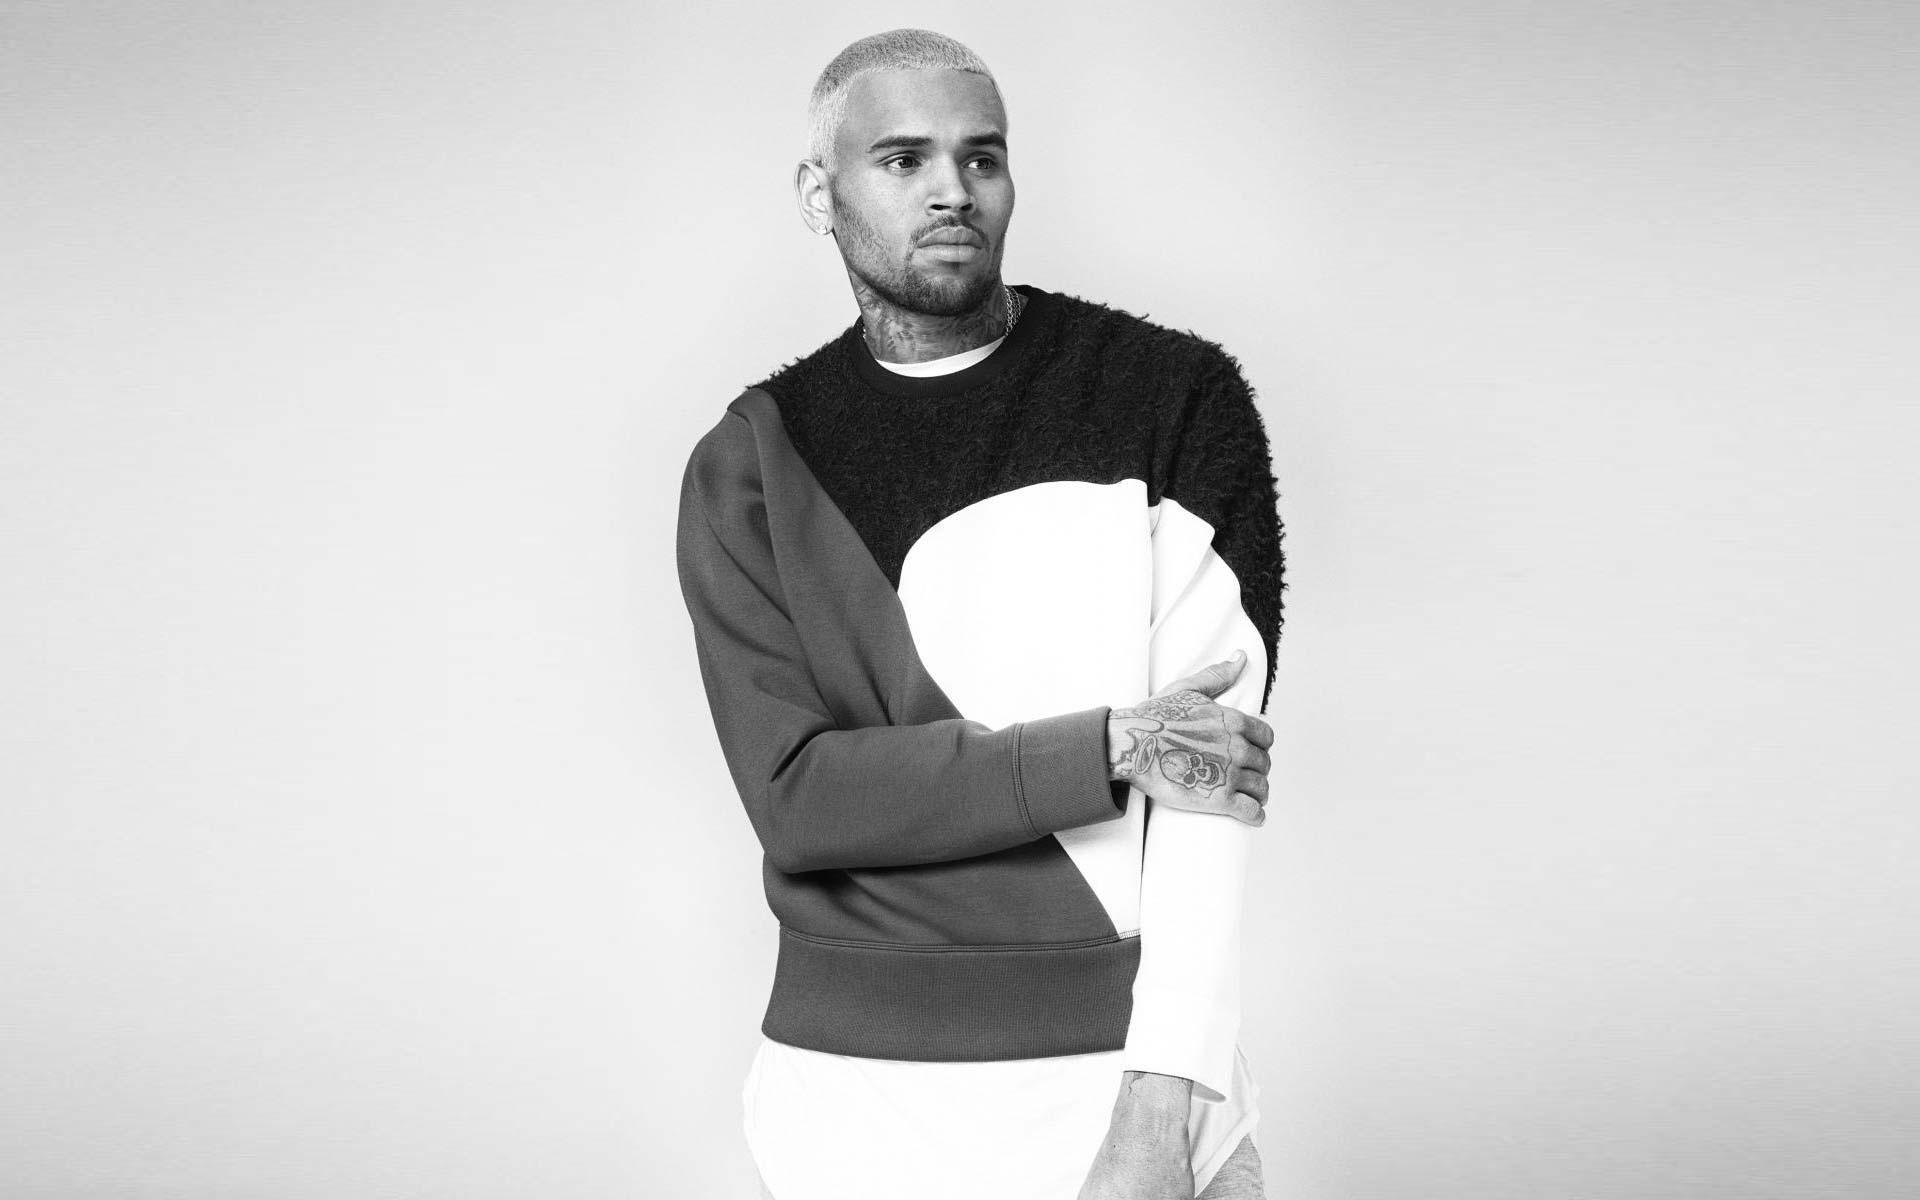 Fall Out Boy Wallpaper 2015 Chris Brown Images Free Pixelstalk Net